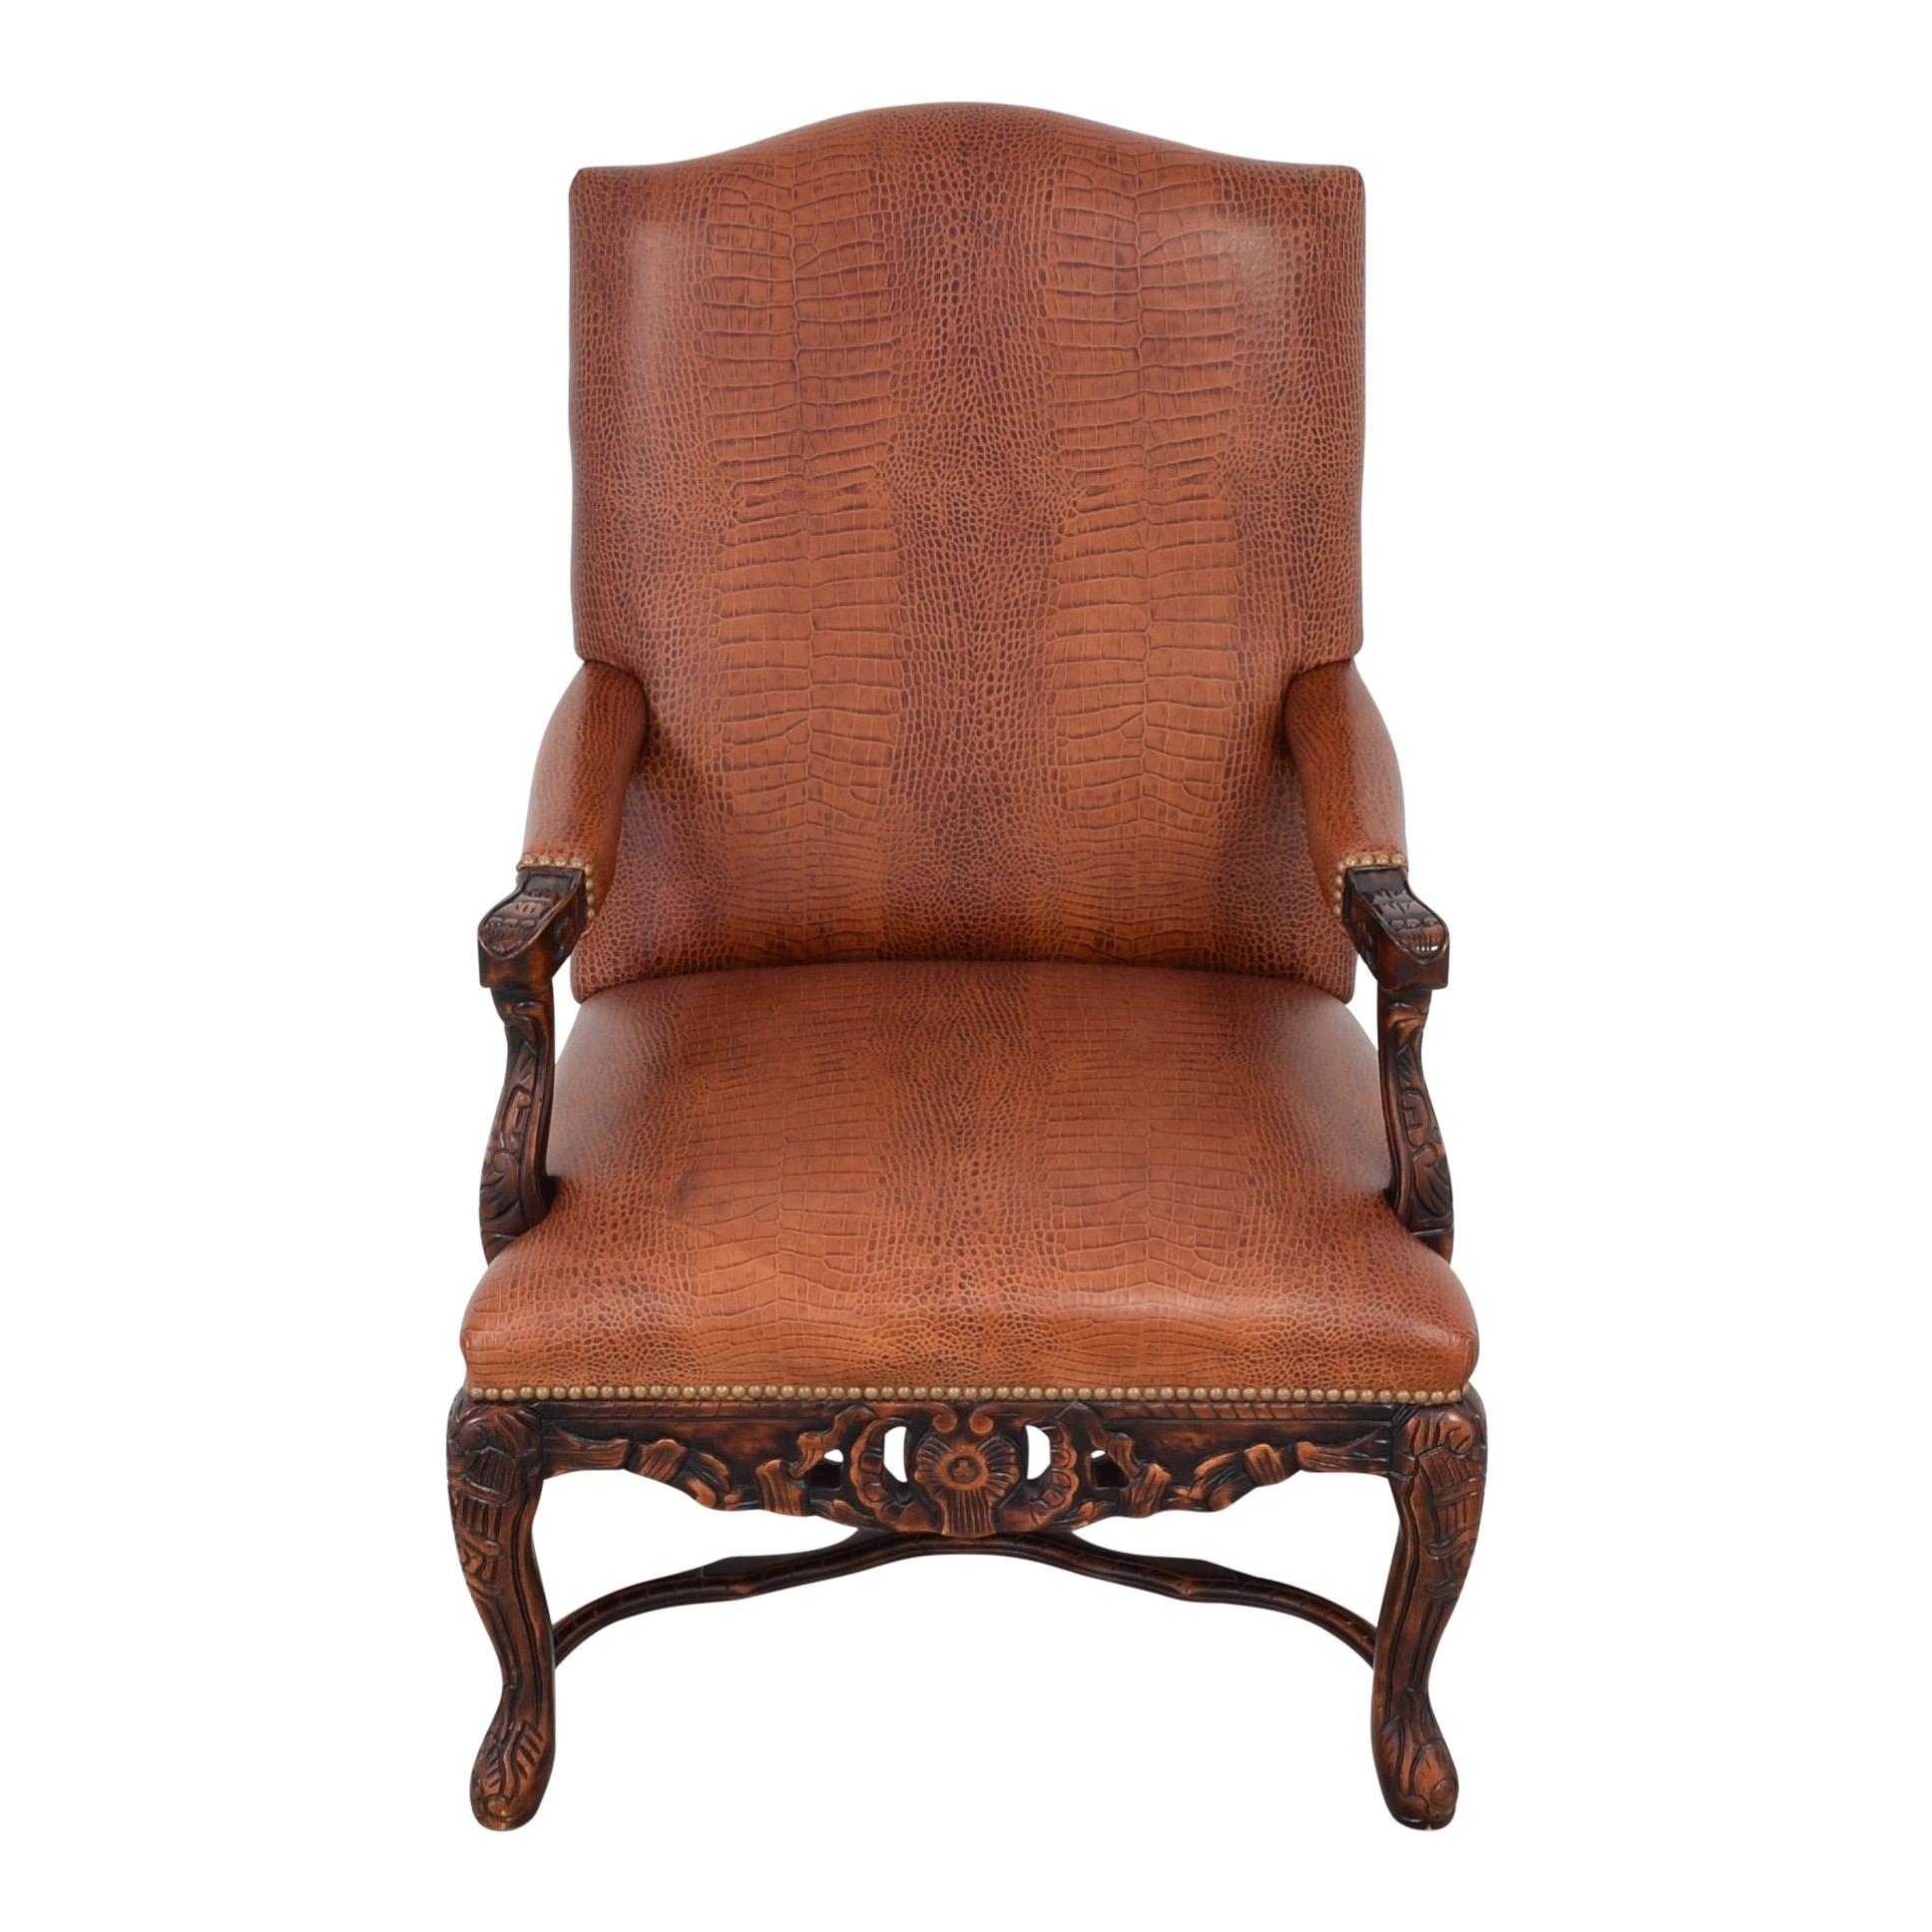 ABC Carpet & Home ABC Carpet & Home Bishop Chair second hand